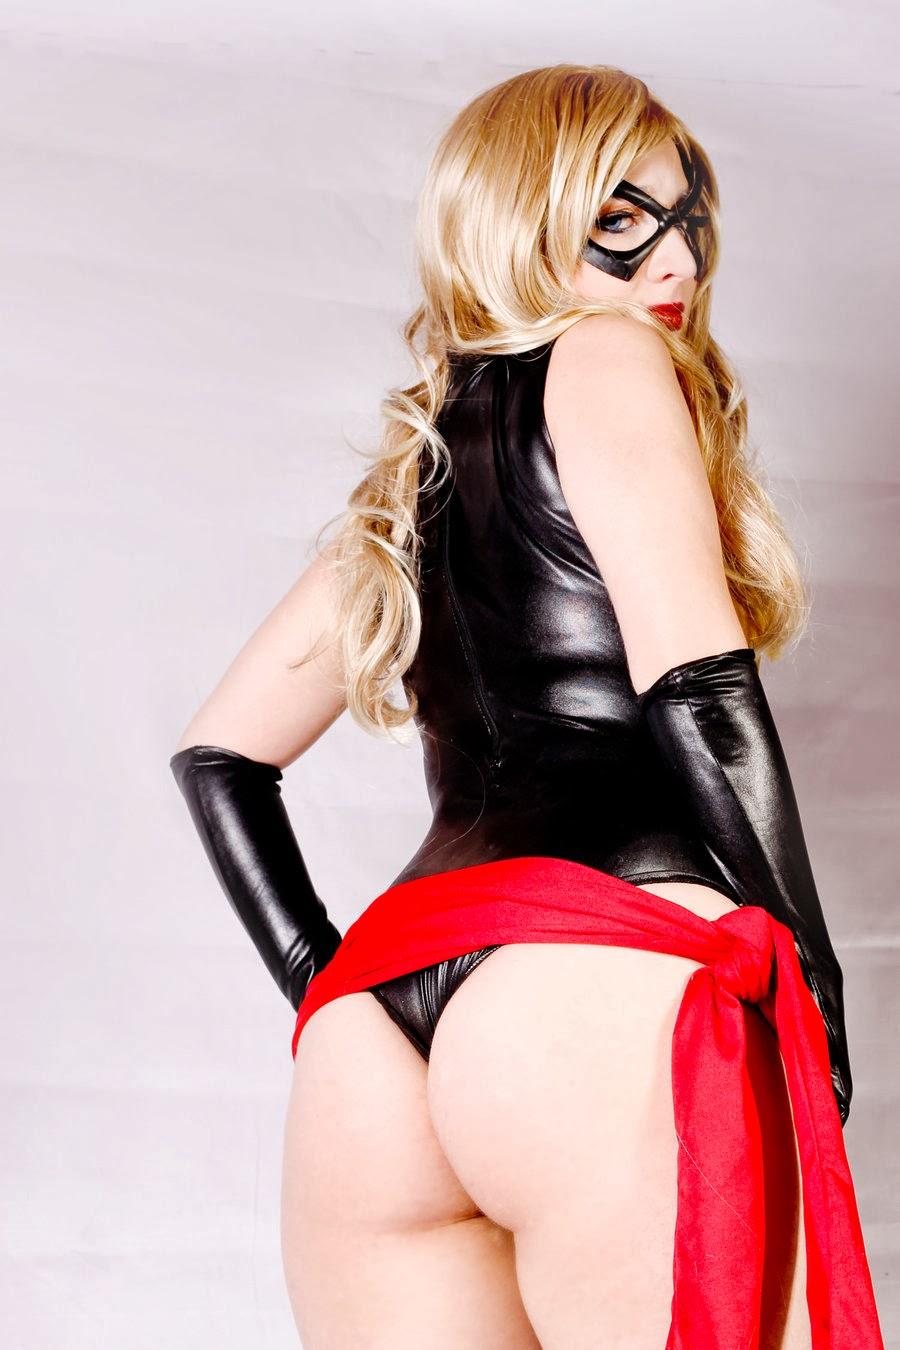 Big Culo Day 2014: Miss Marvel Cosplay